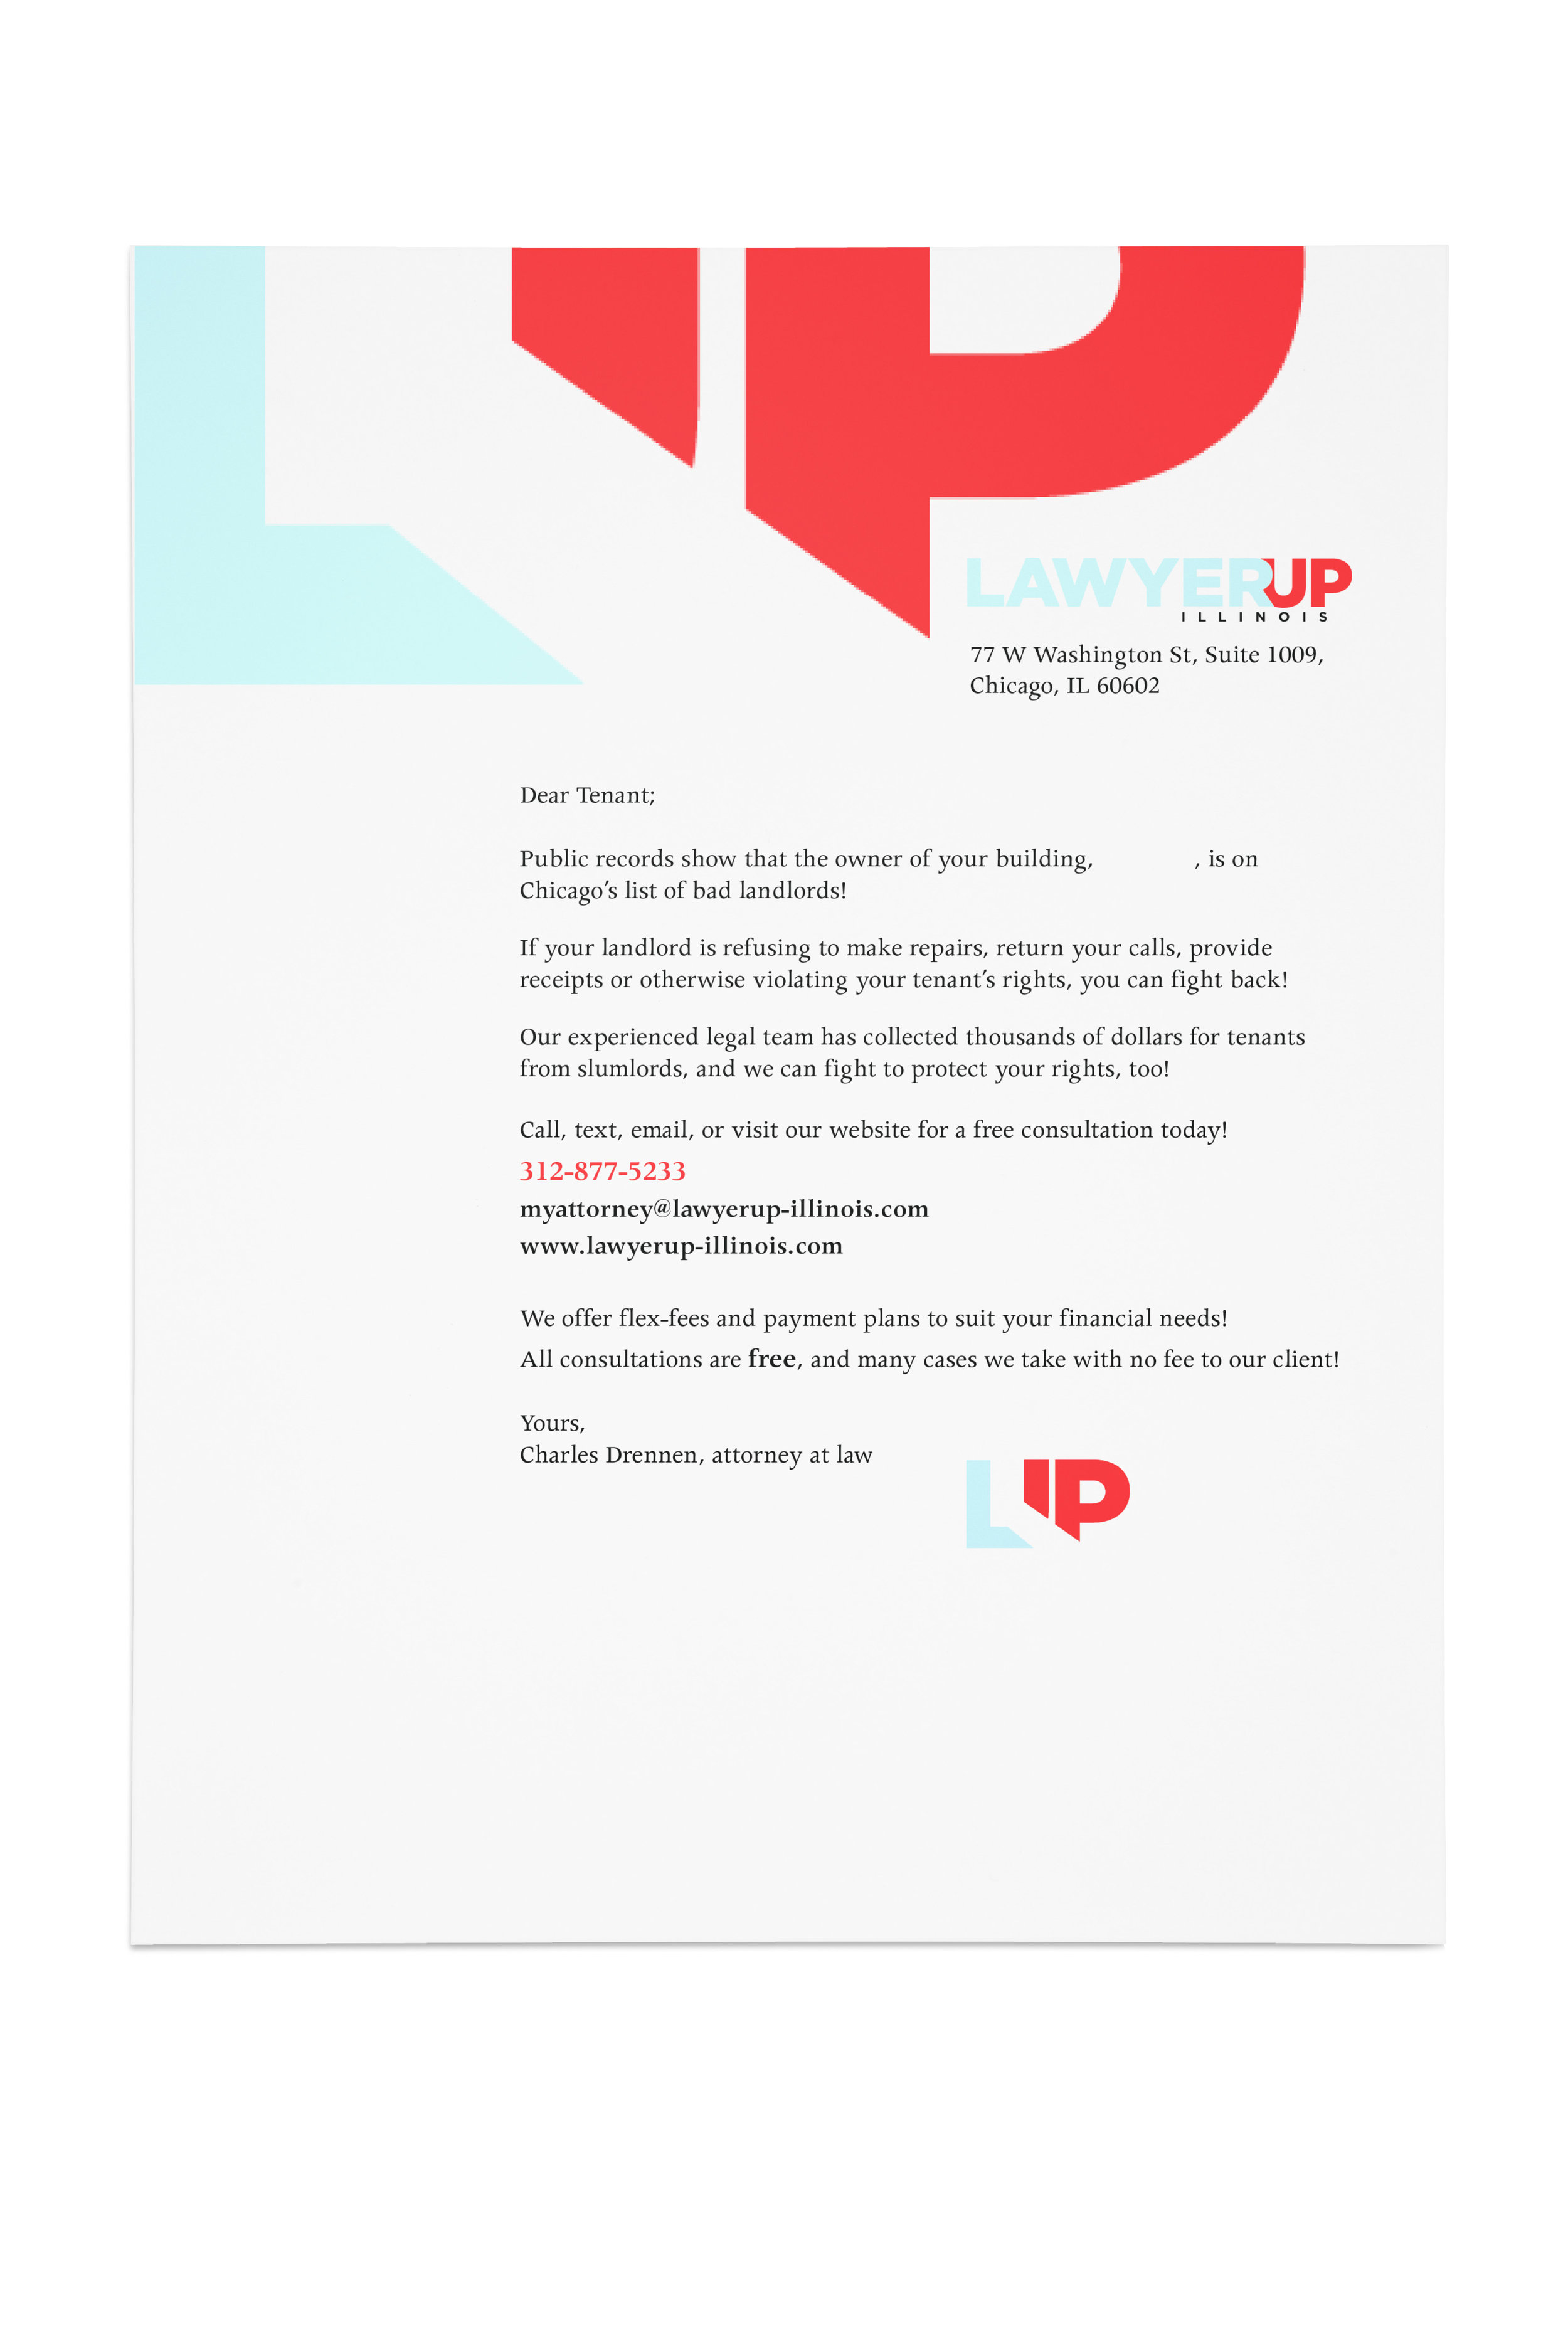 Letterhead 0426-1 2018-04-15.jpg